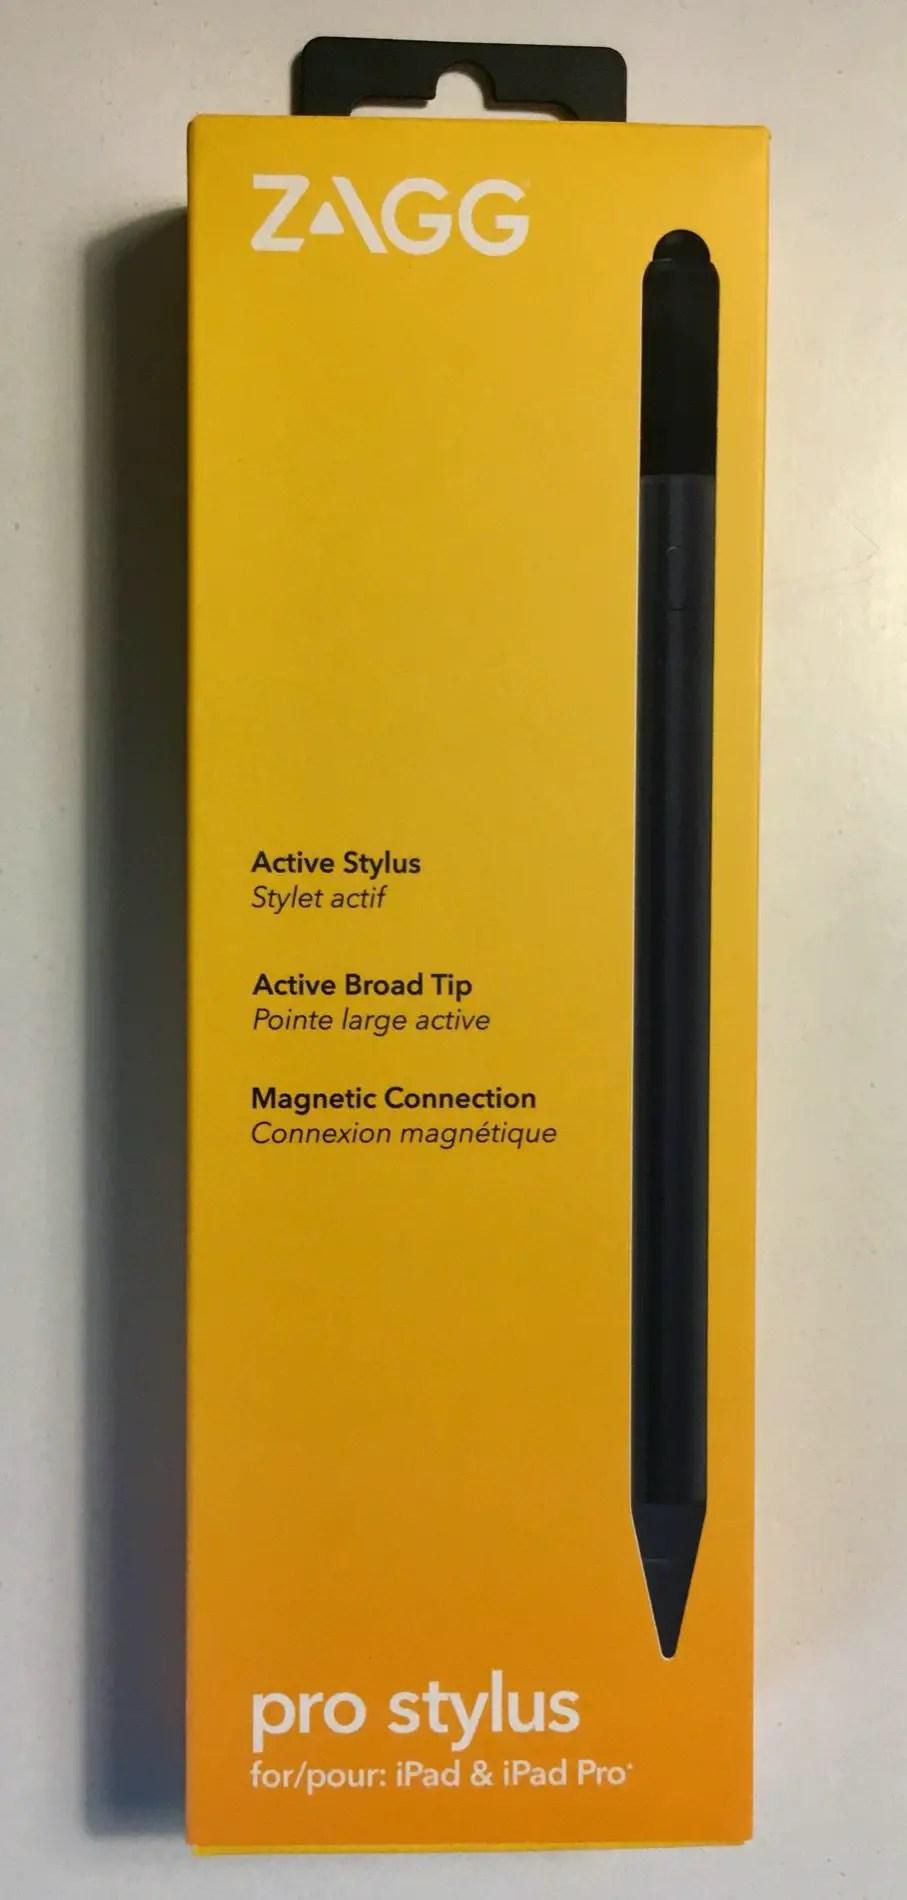 In Review: Zagg Pro Stylus